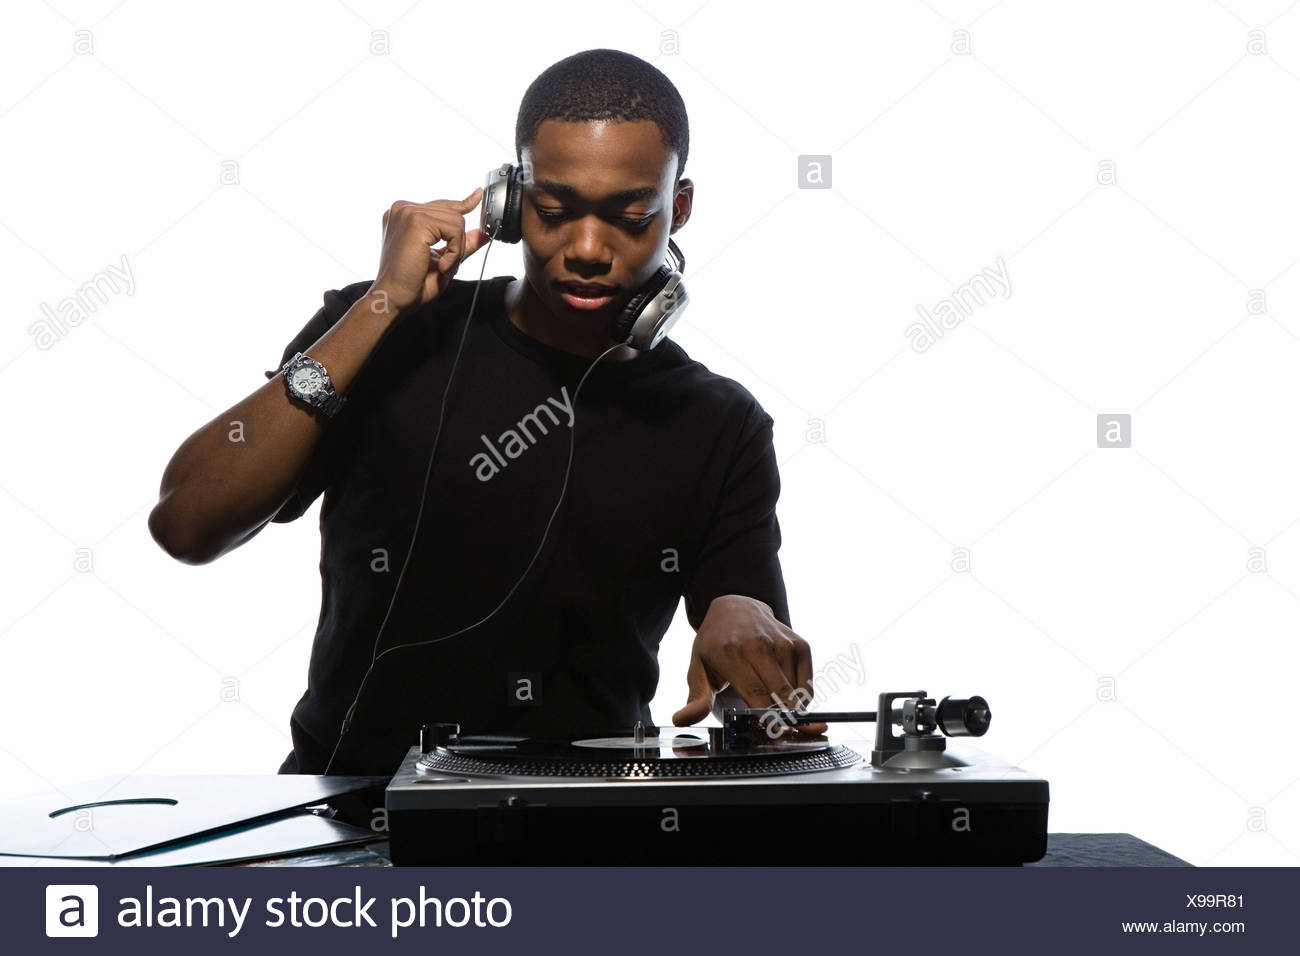 Young man djing - Stock Image